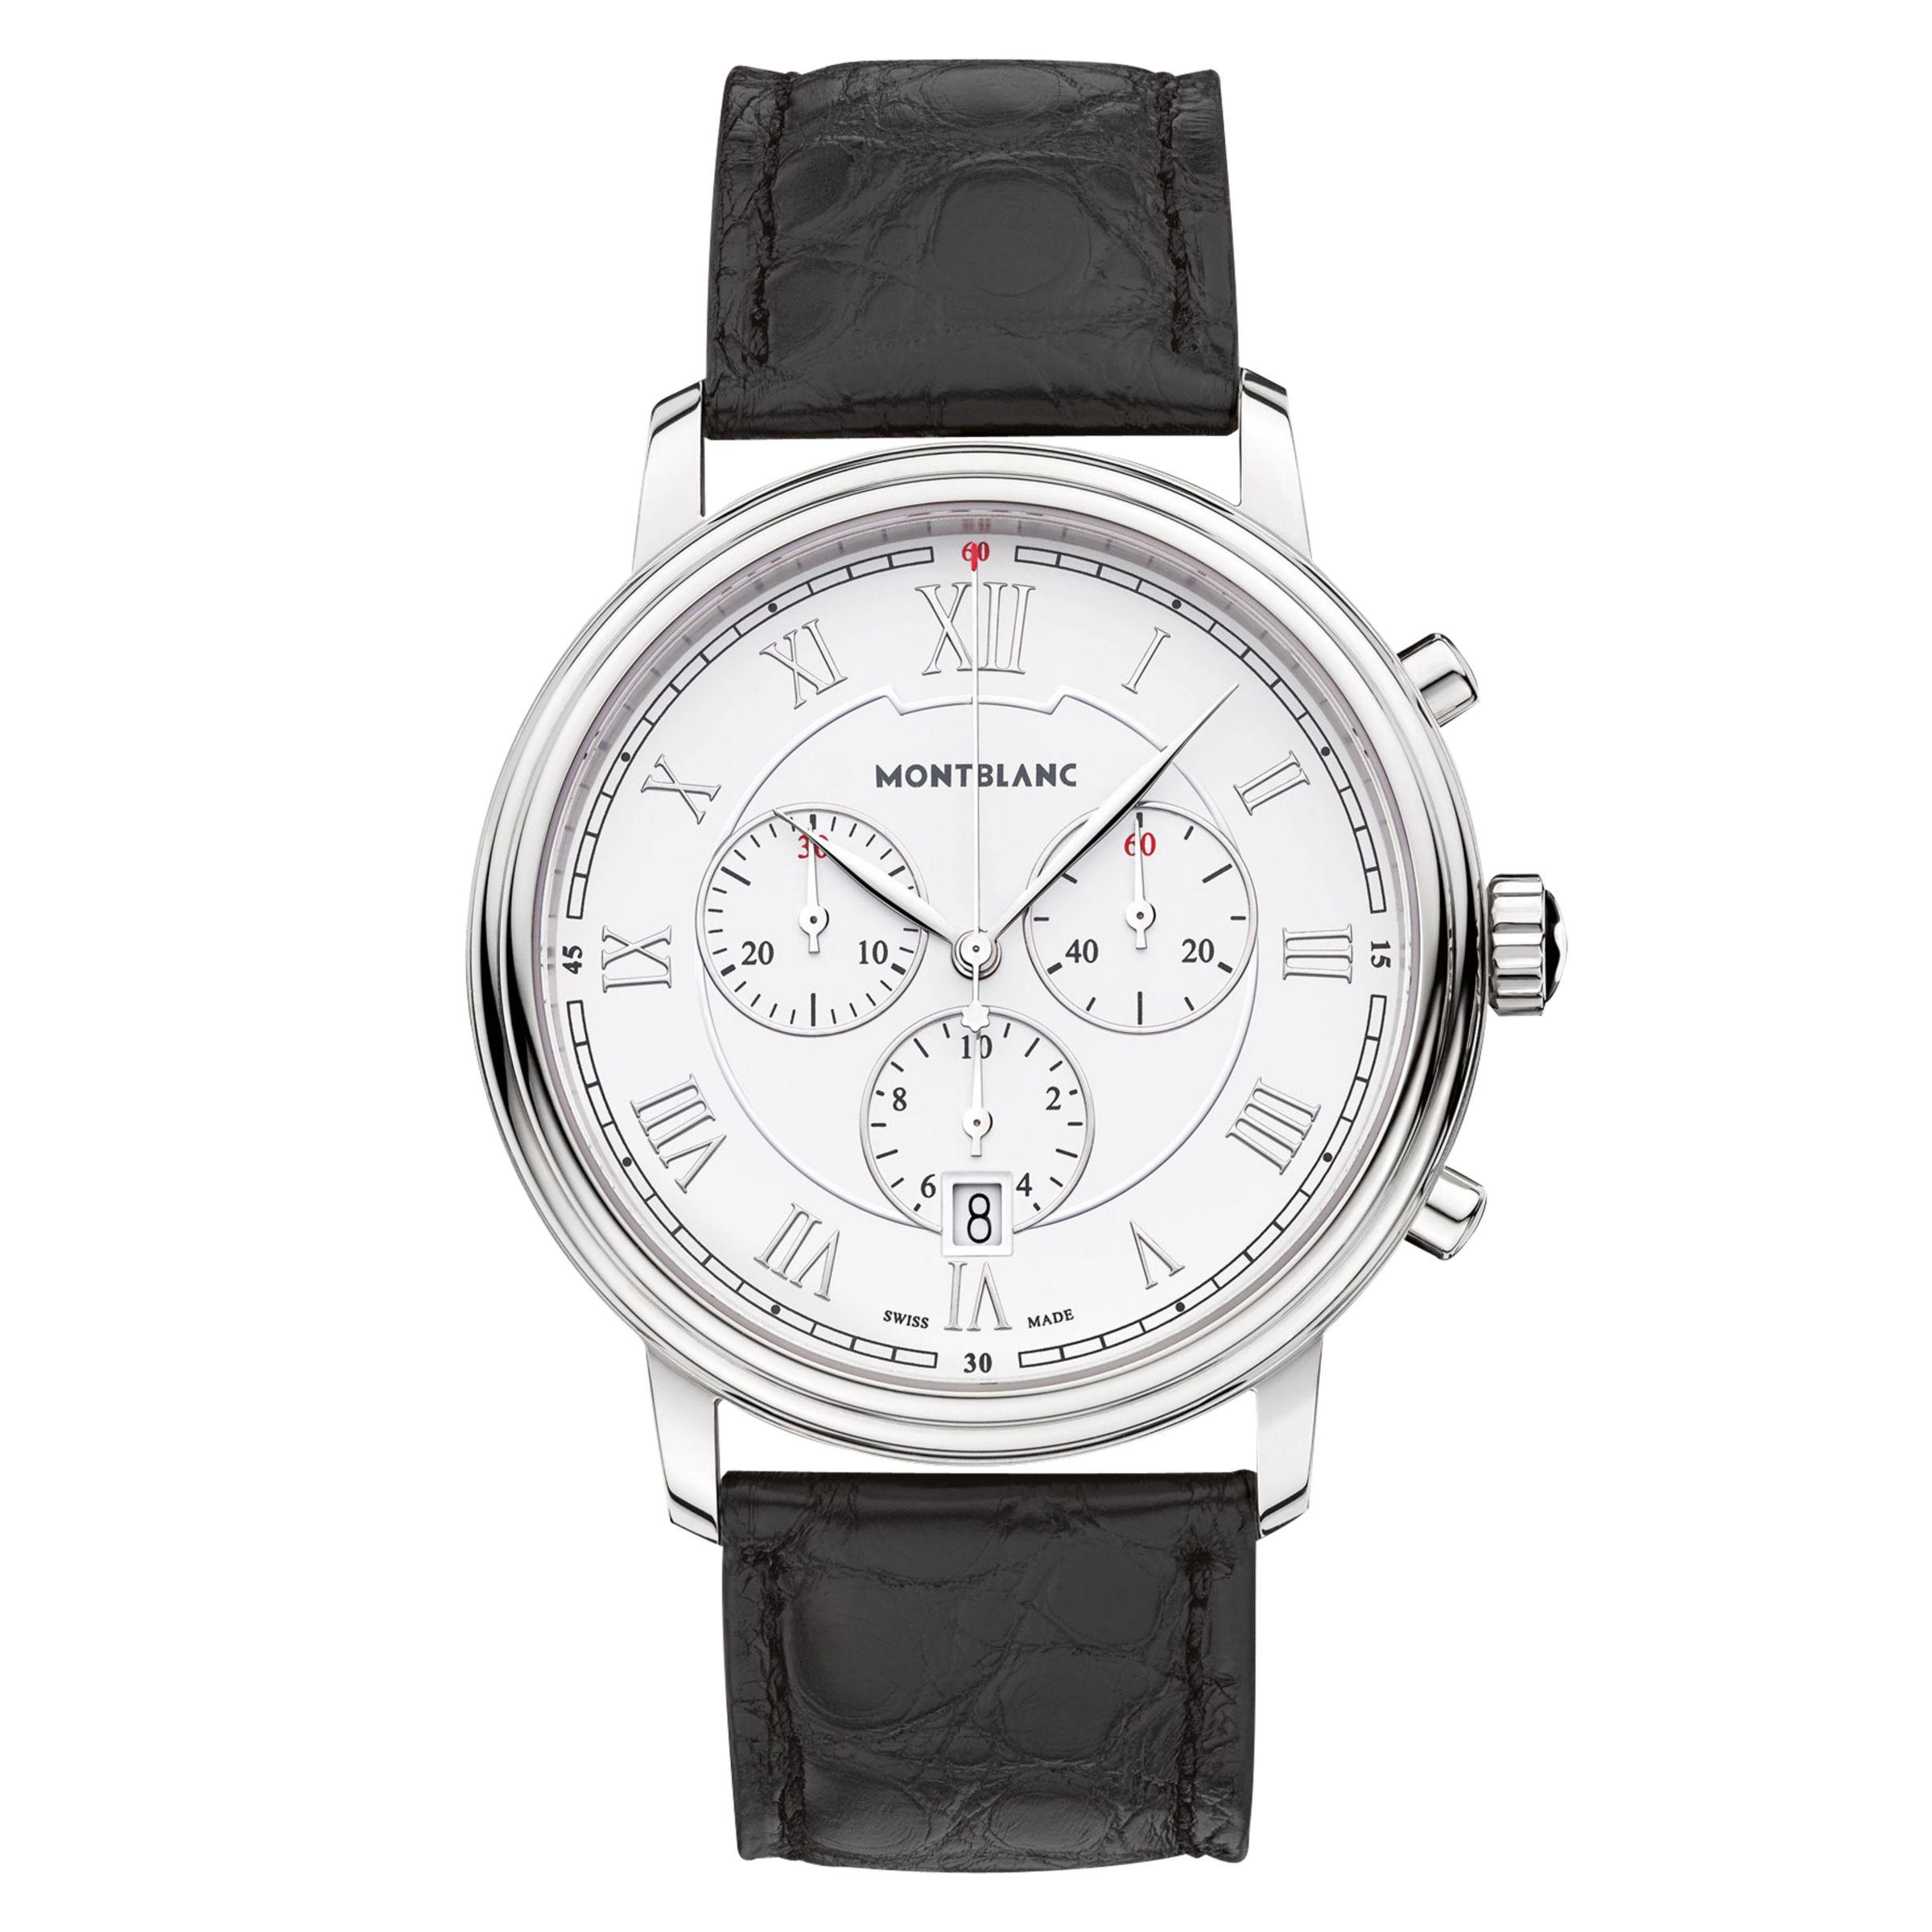 Montblanc Montblanc 114339 Men's Tradition Chronograph Alligator Leather Strap Watch, Black/White